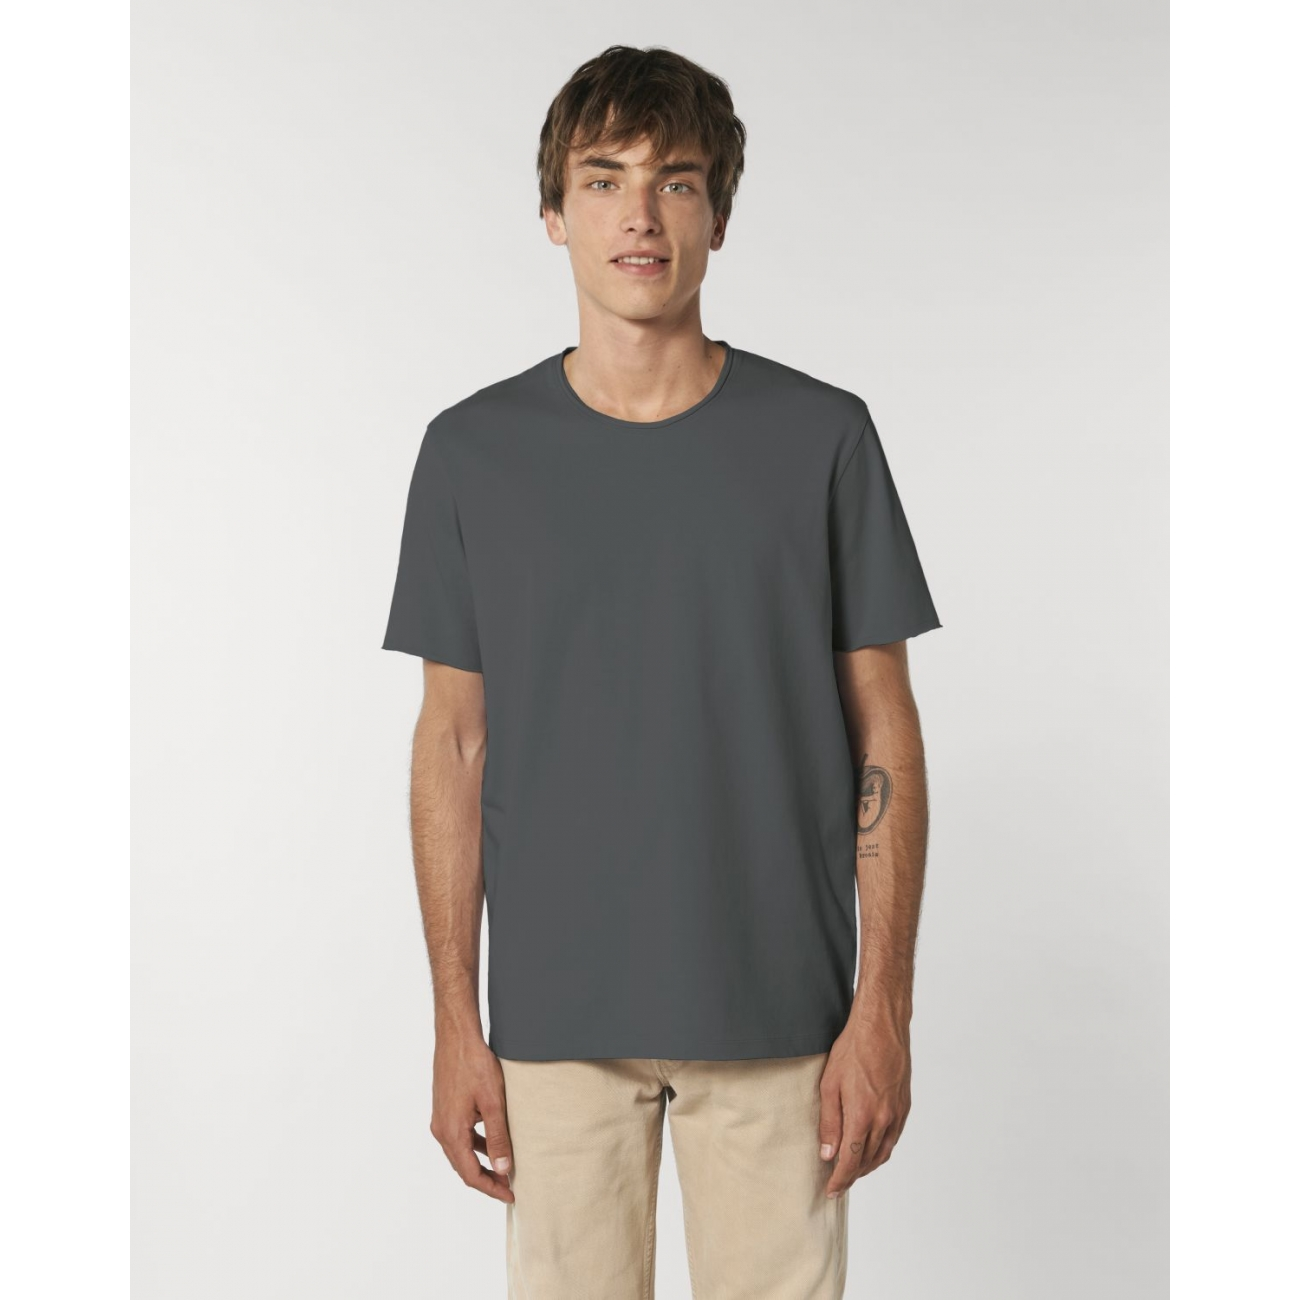 https://tee-shirt-bio.com/10853-thickbox_default/tee-shirt-a-bords-coupes-brut-coton-bio-anthracite.jpg